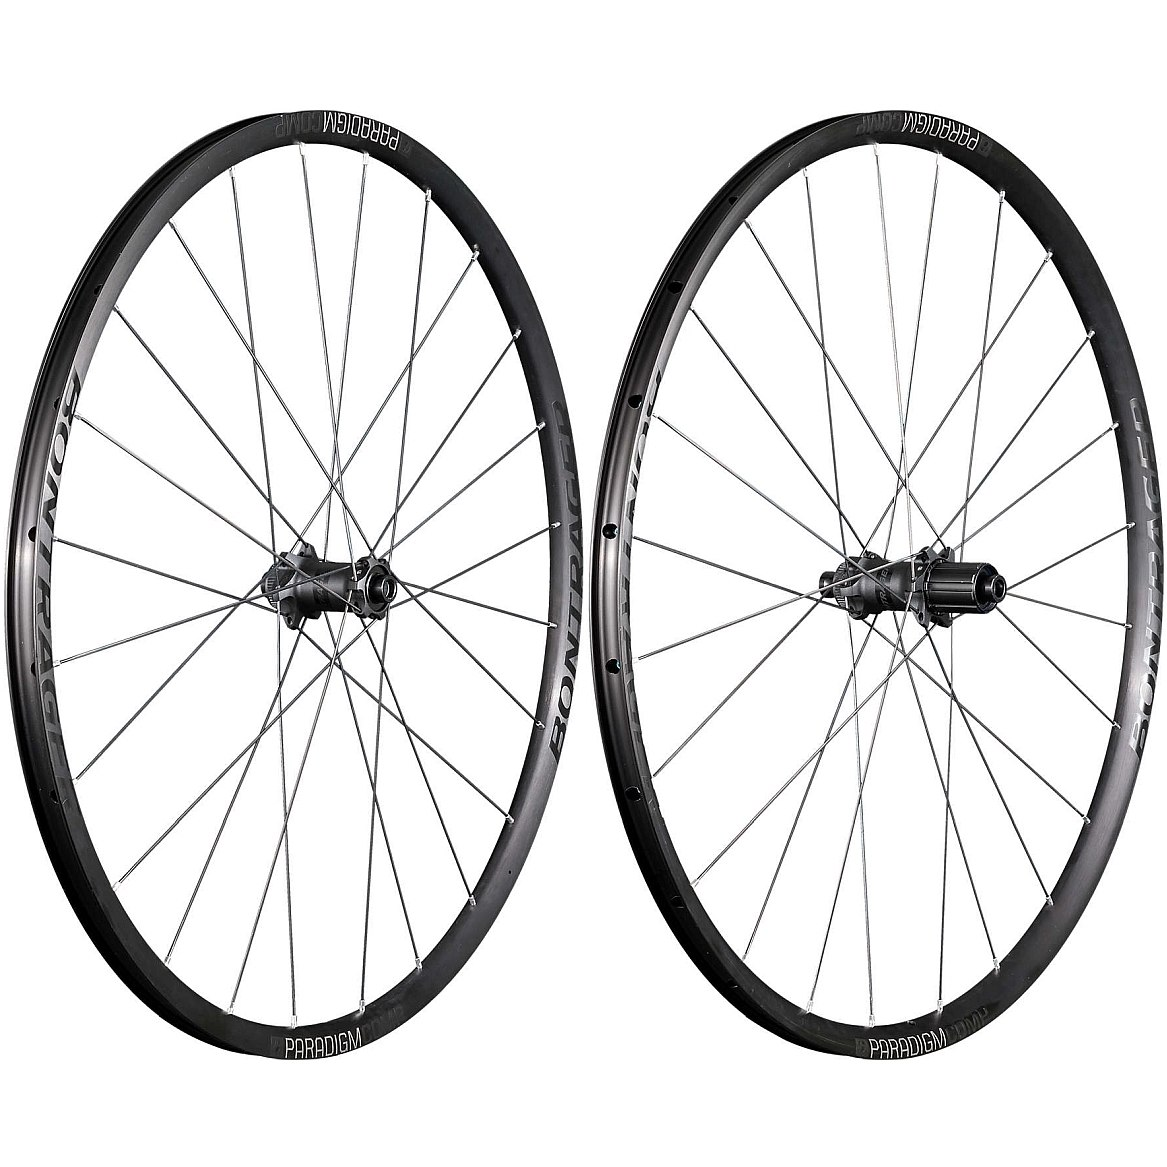 Bontrager Paradigm Comp TLR Disc Road Wheelset - Clincher - Centerlock - FW: 12x100mm / RW: 12x142mm